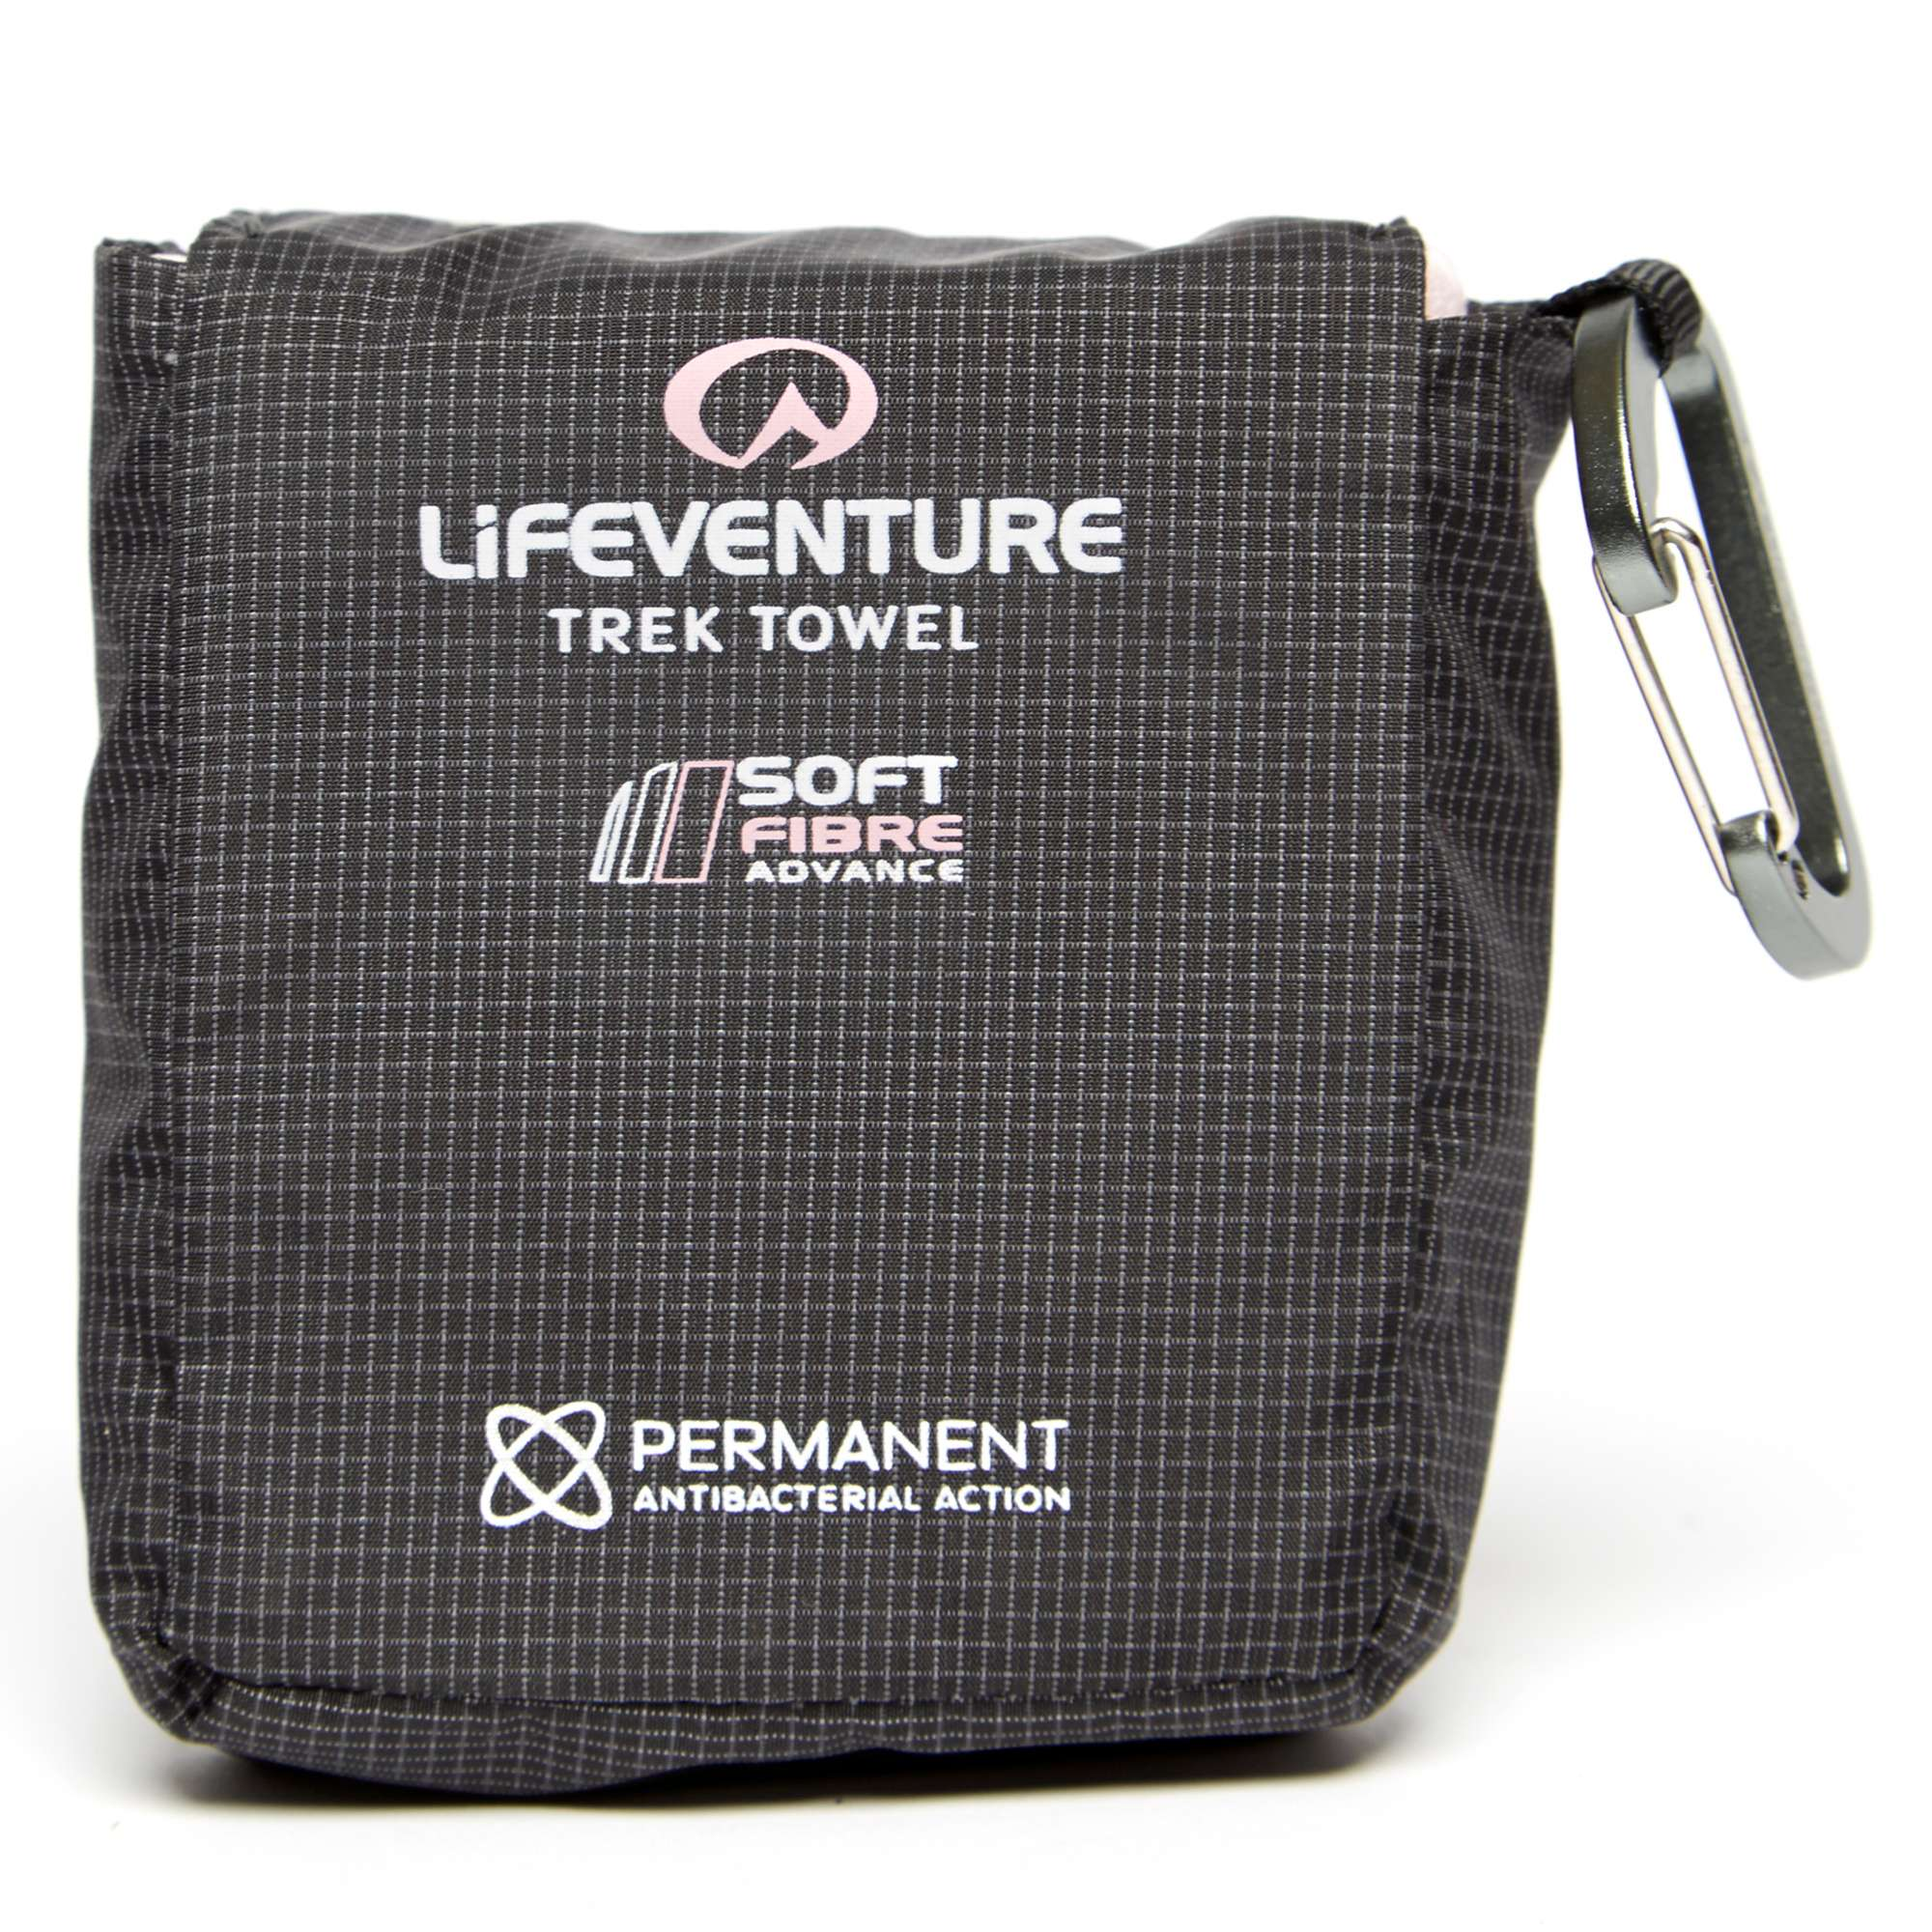 LIFEVENTURE Pocket Towel